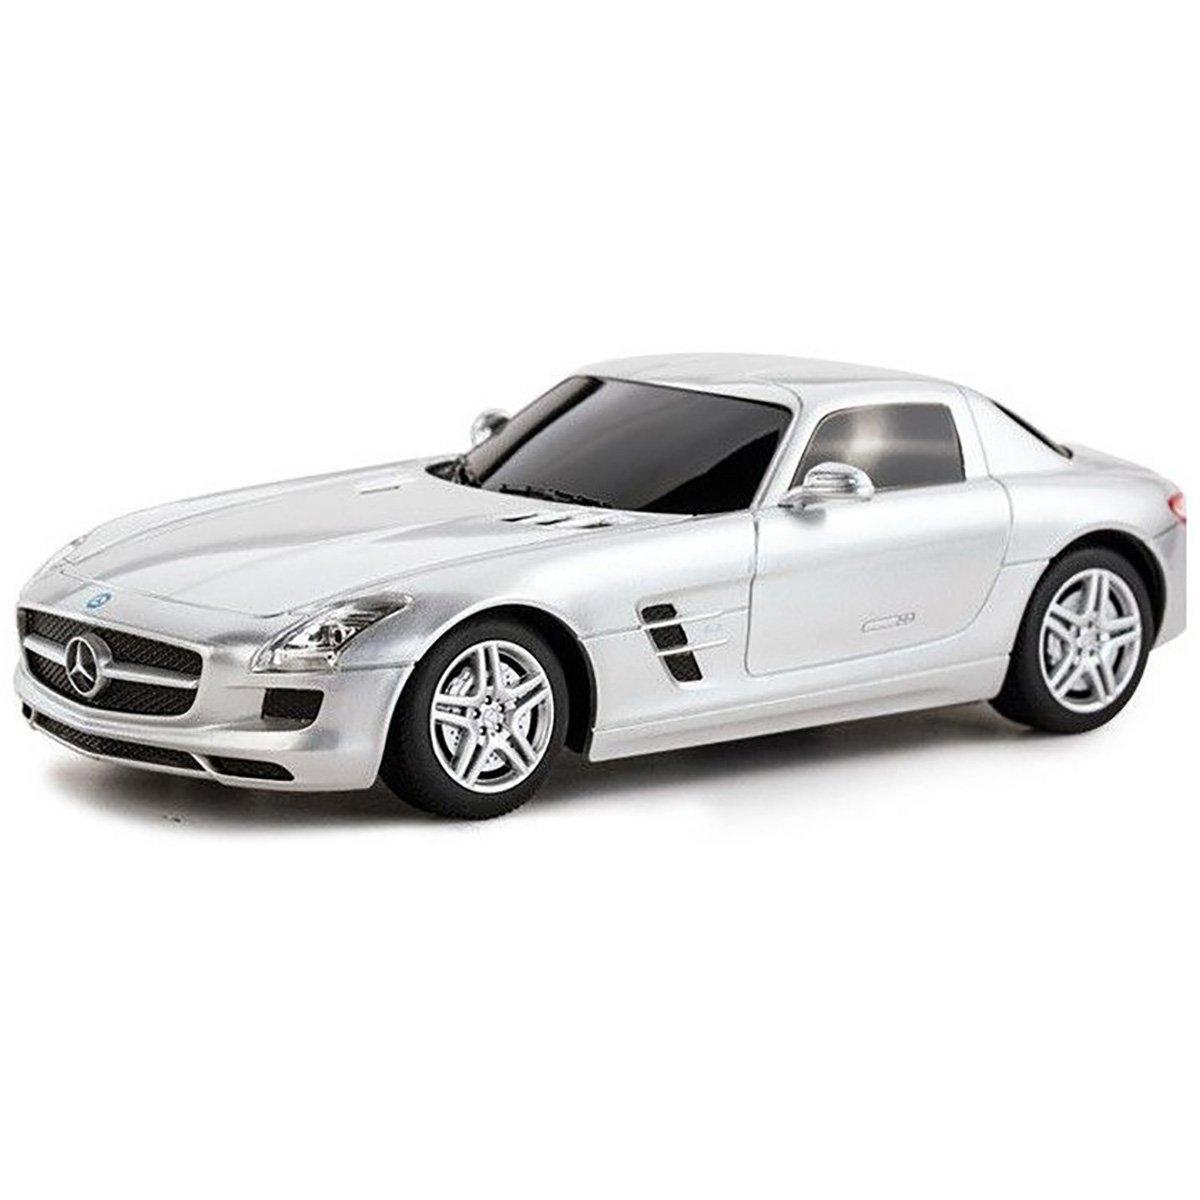 Masinuta Rastar Mercedes-Benz SLS AMG, Gri, 1:43